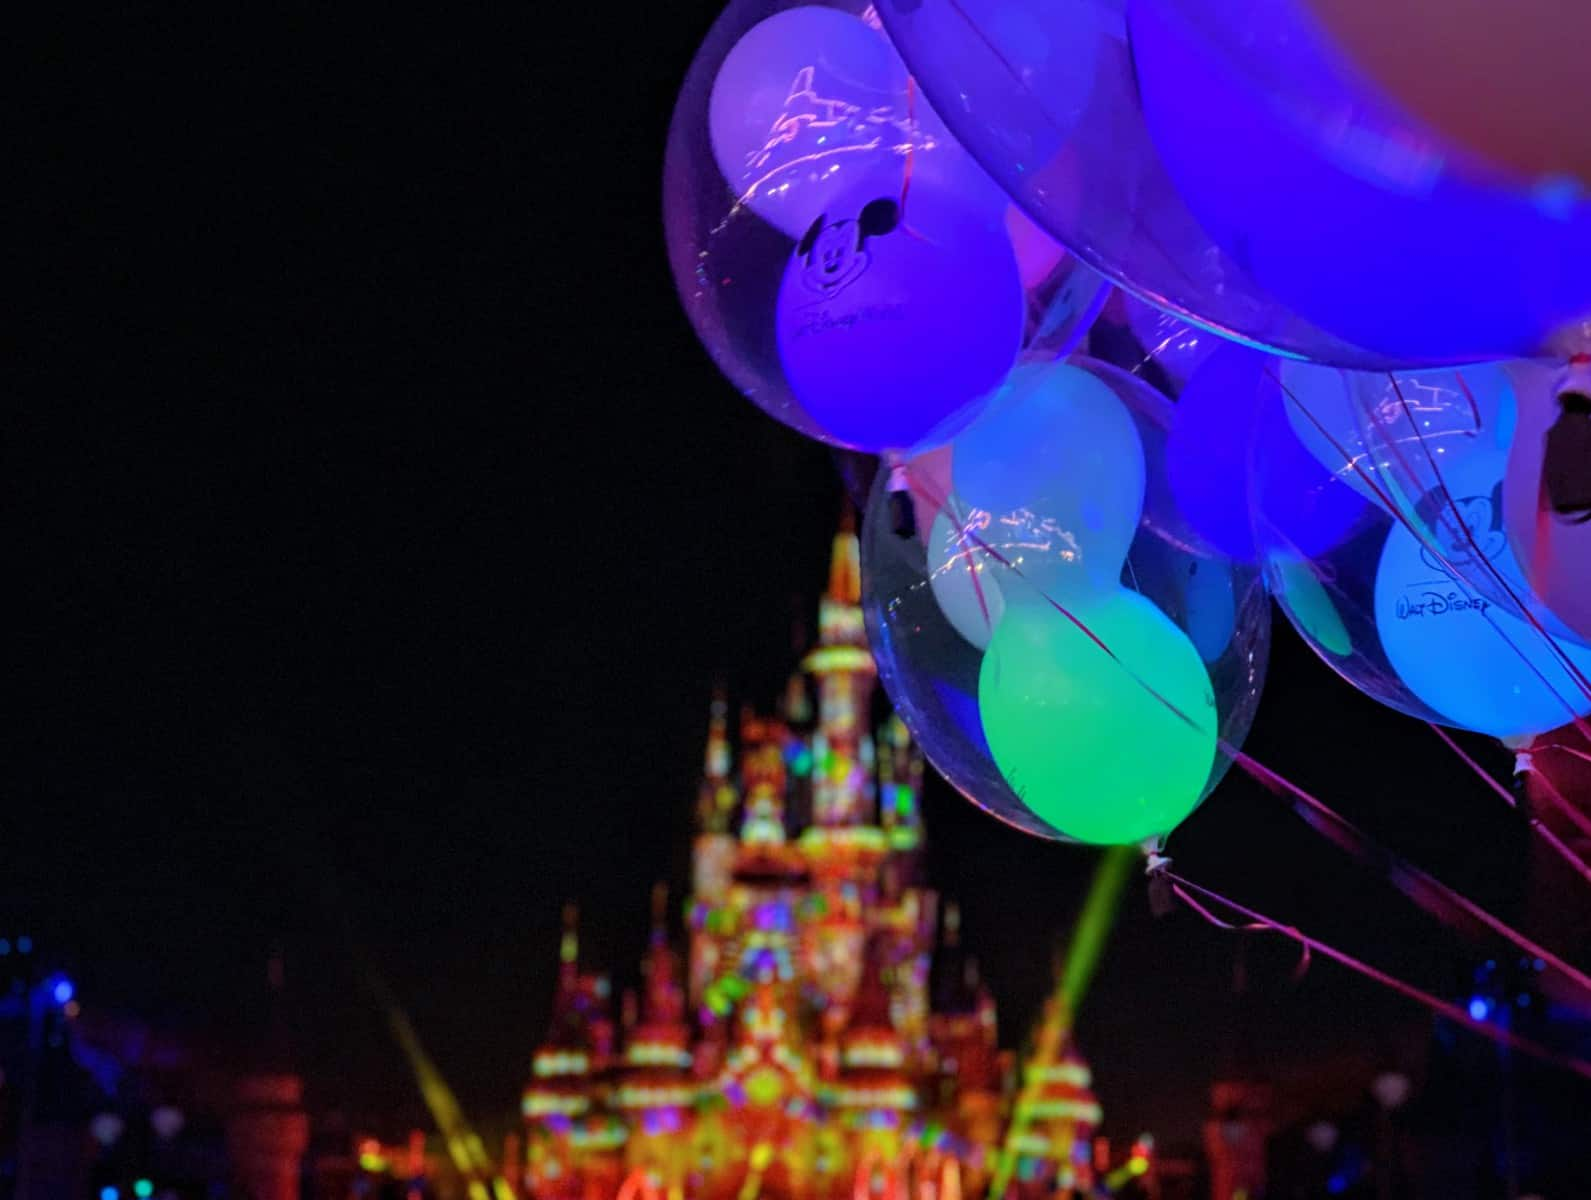 cinderella castle at night balloons walt disney world magic kingdom